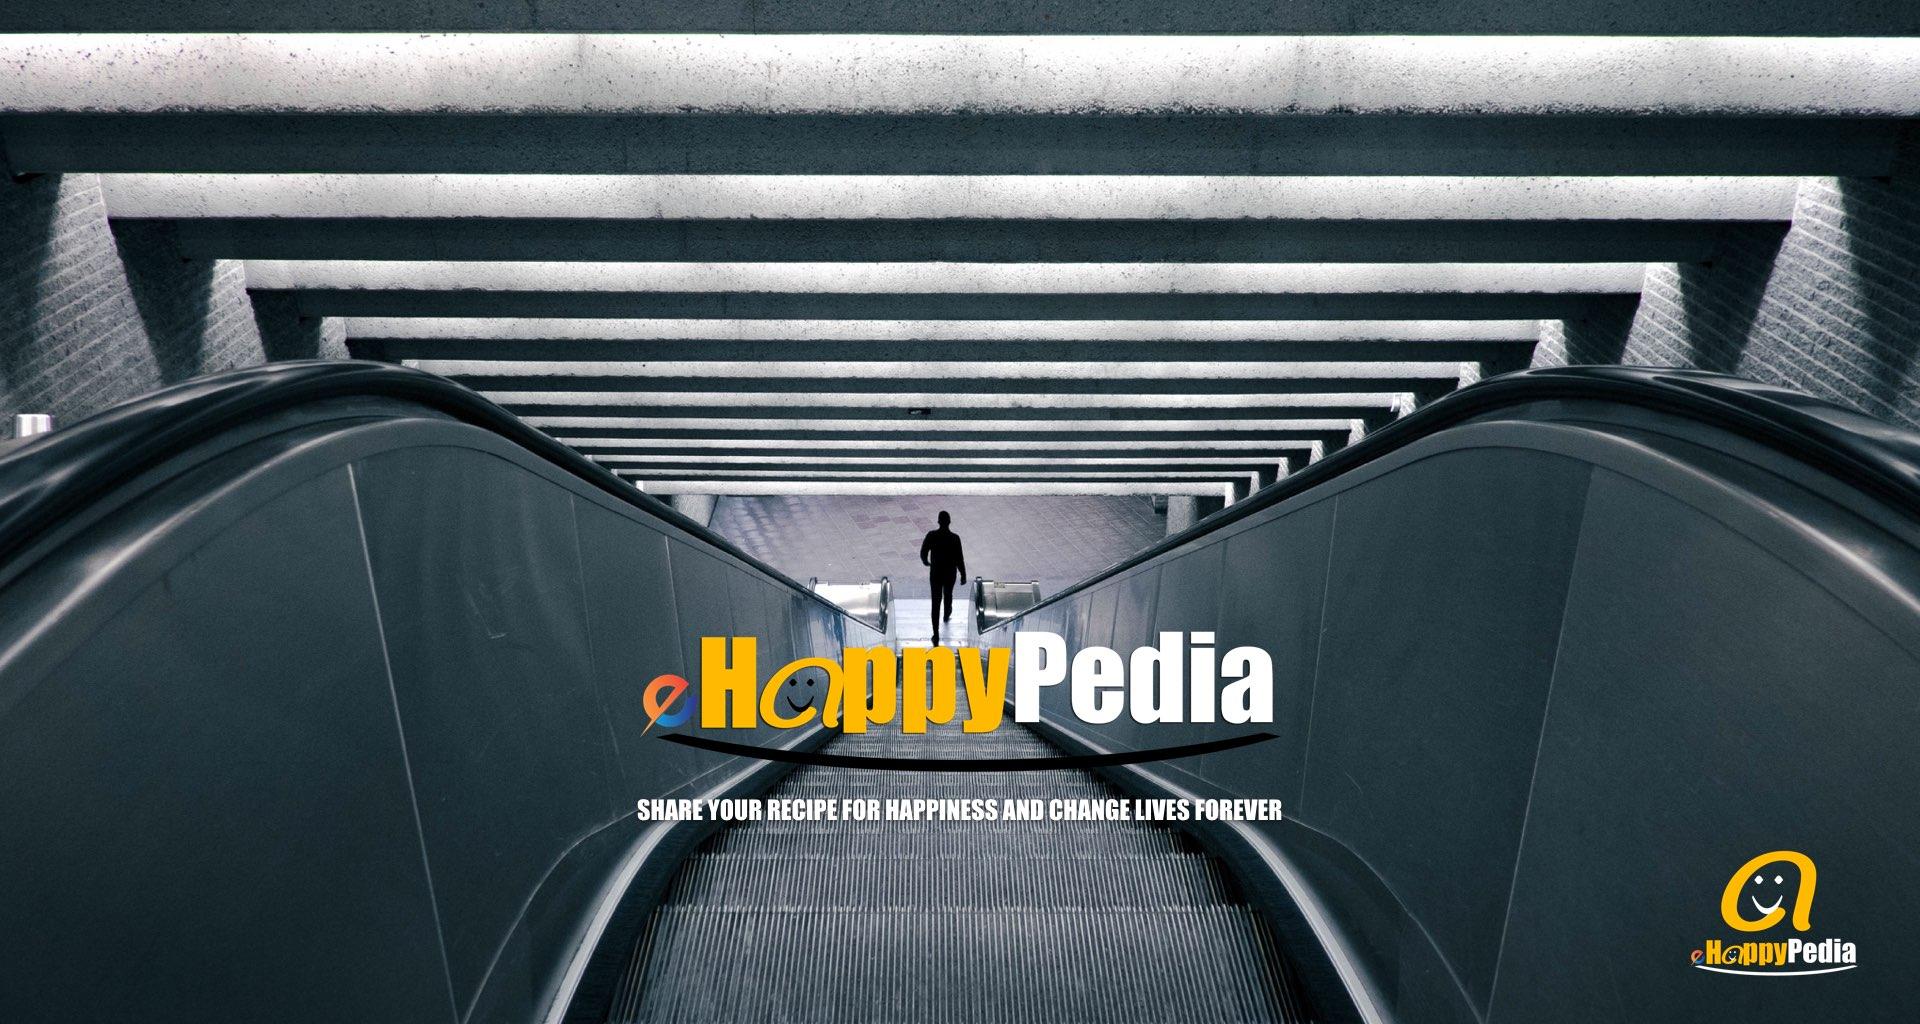 ehappypedia.099.jpeg